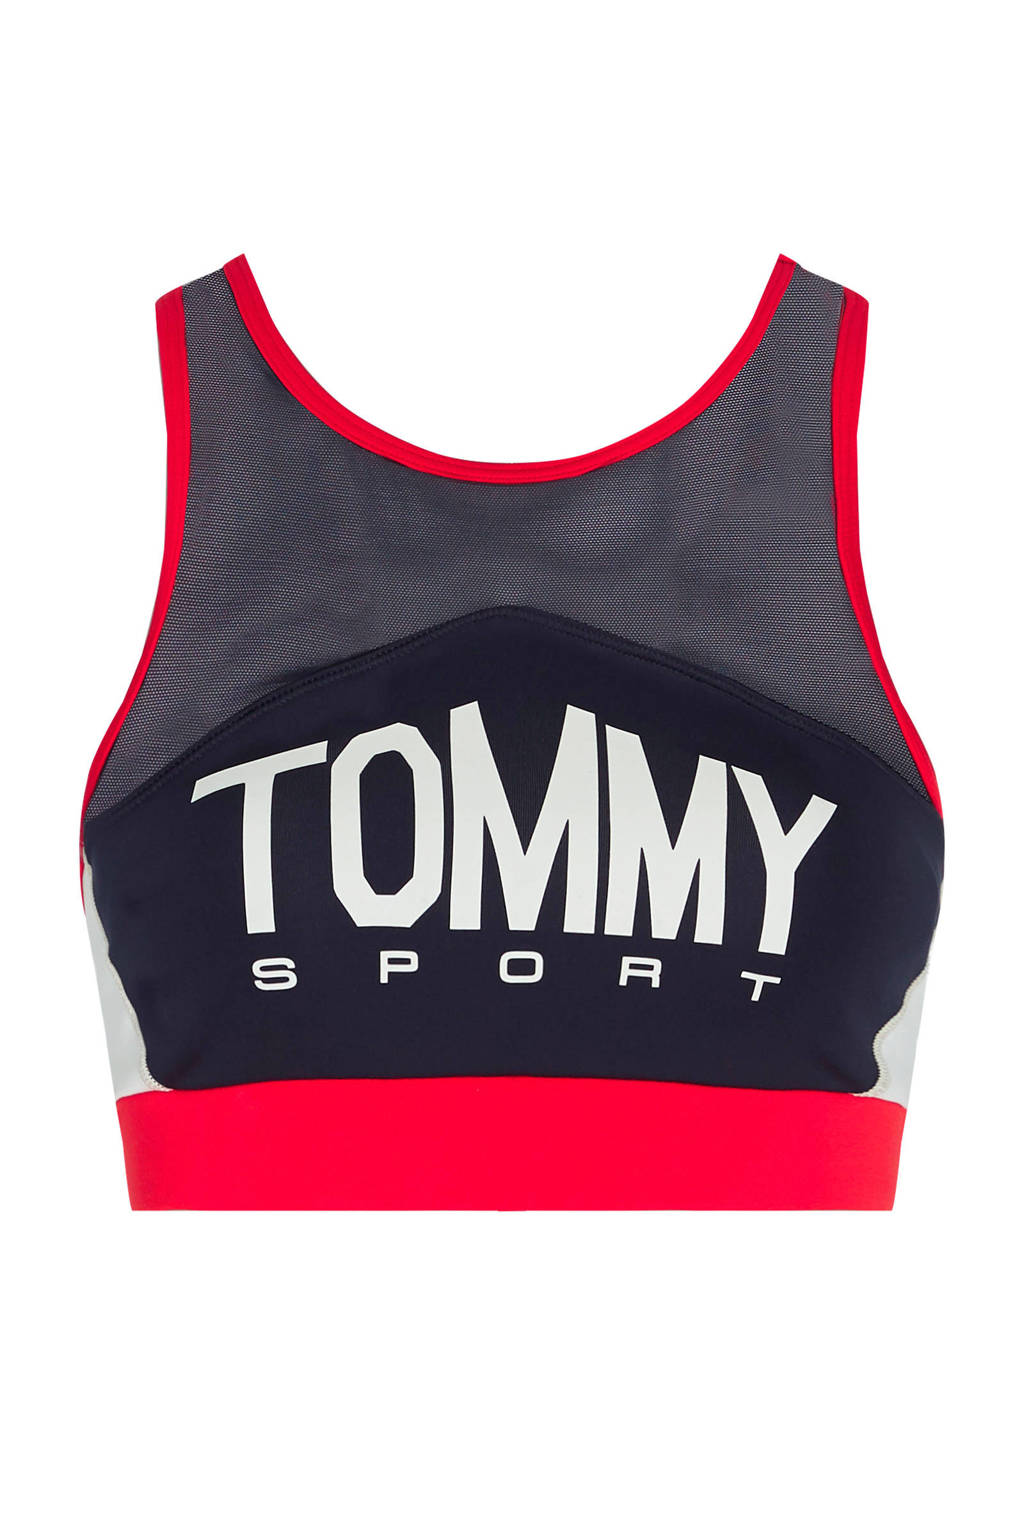 Tommy Hilfiger Sport level 3 sportbh zwart/rood, Zwart/rood